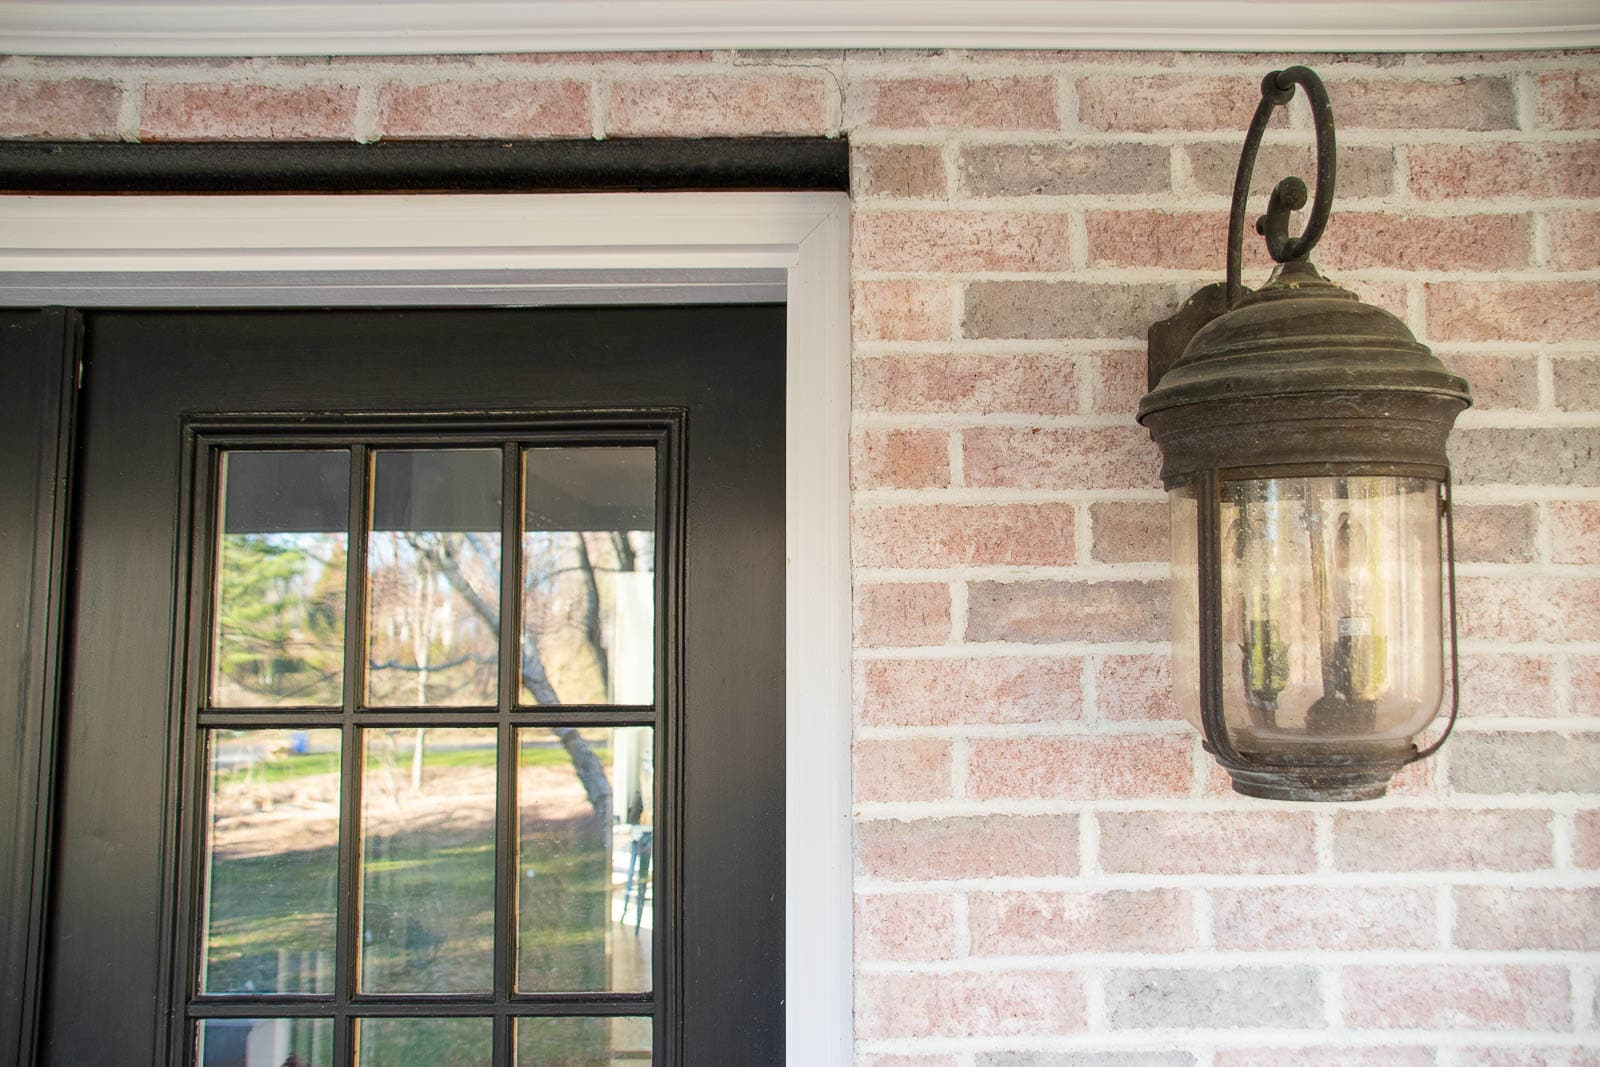 detail of exterior lights